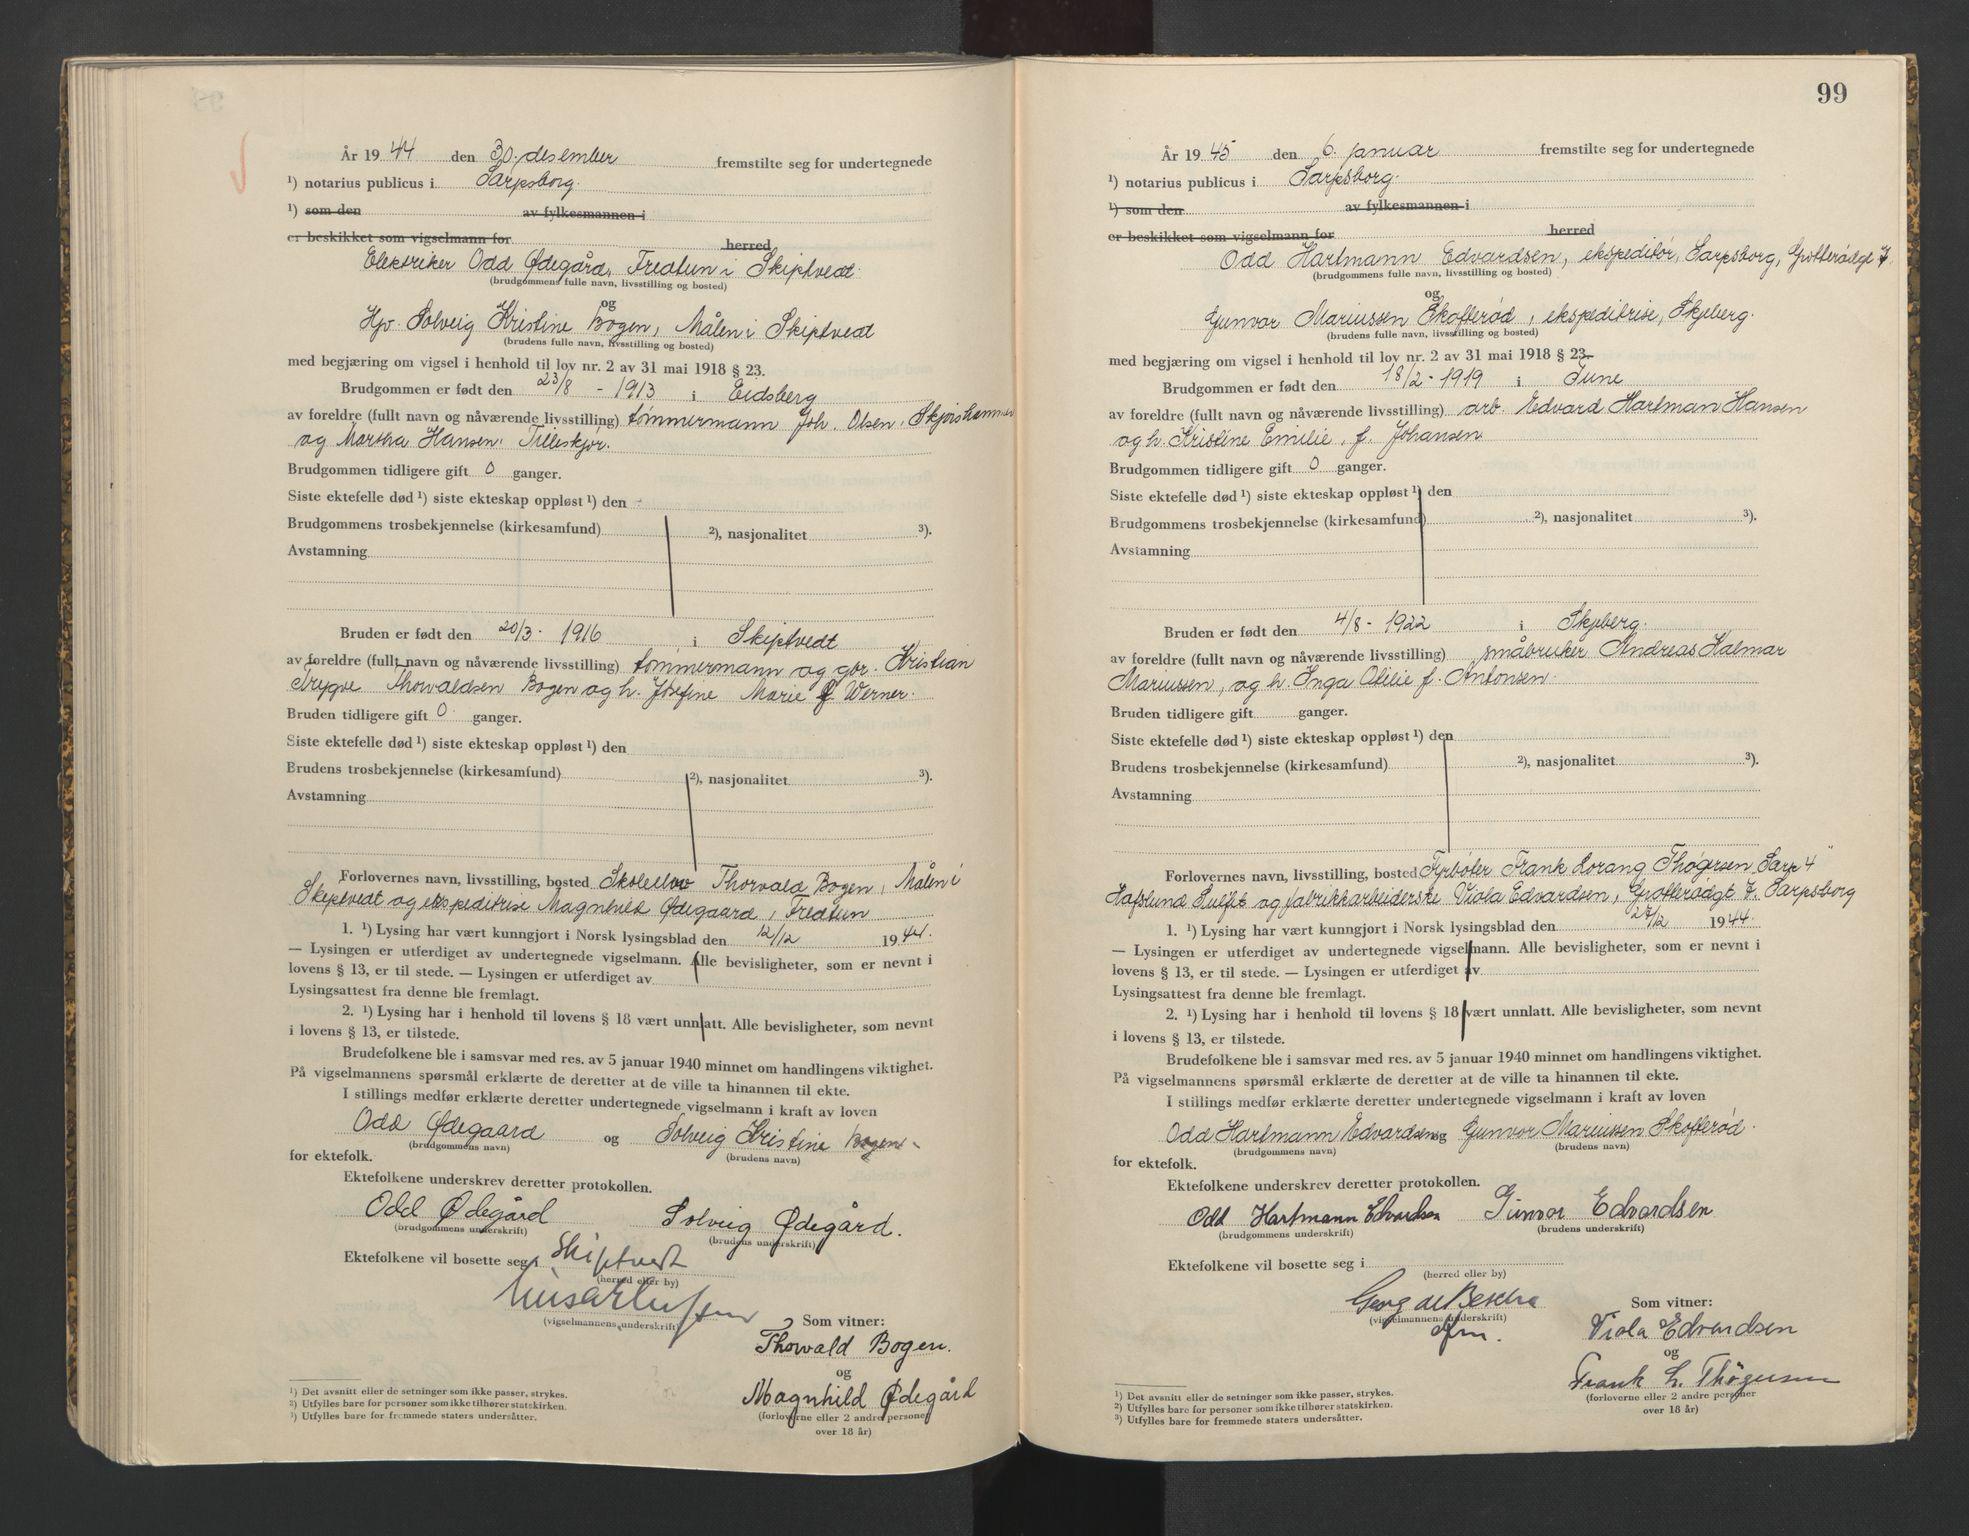 SAO, Sarpsborg byfogd, L/Lb/Lba/L0003: Vigselbok, 1943-1945, s. 99